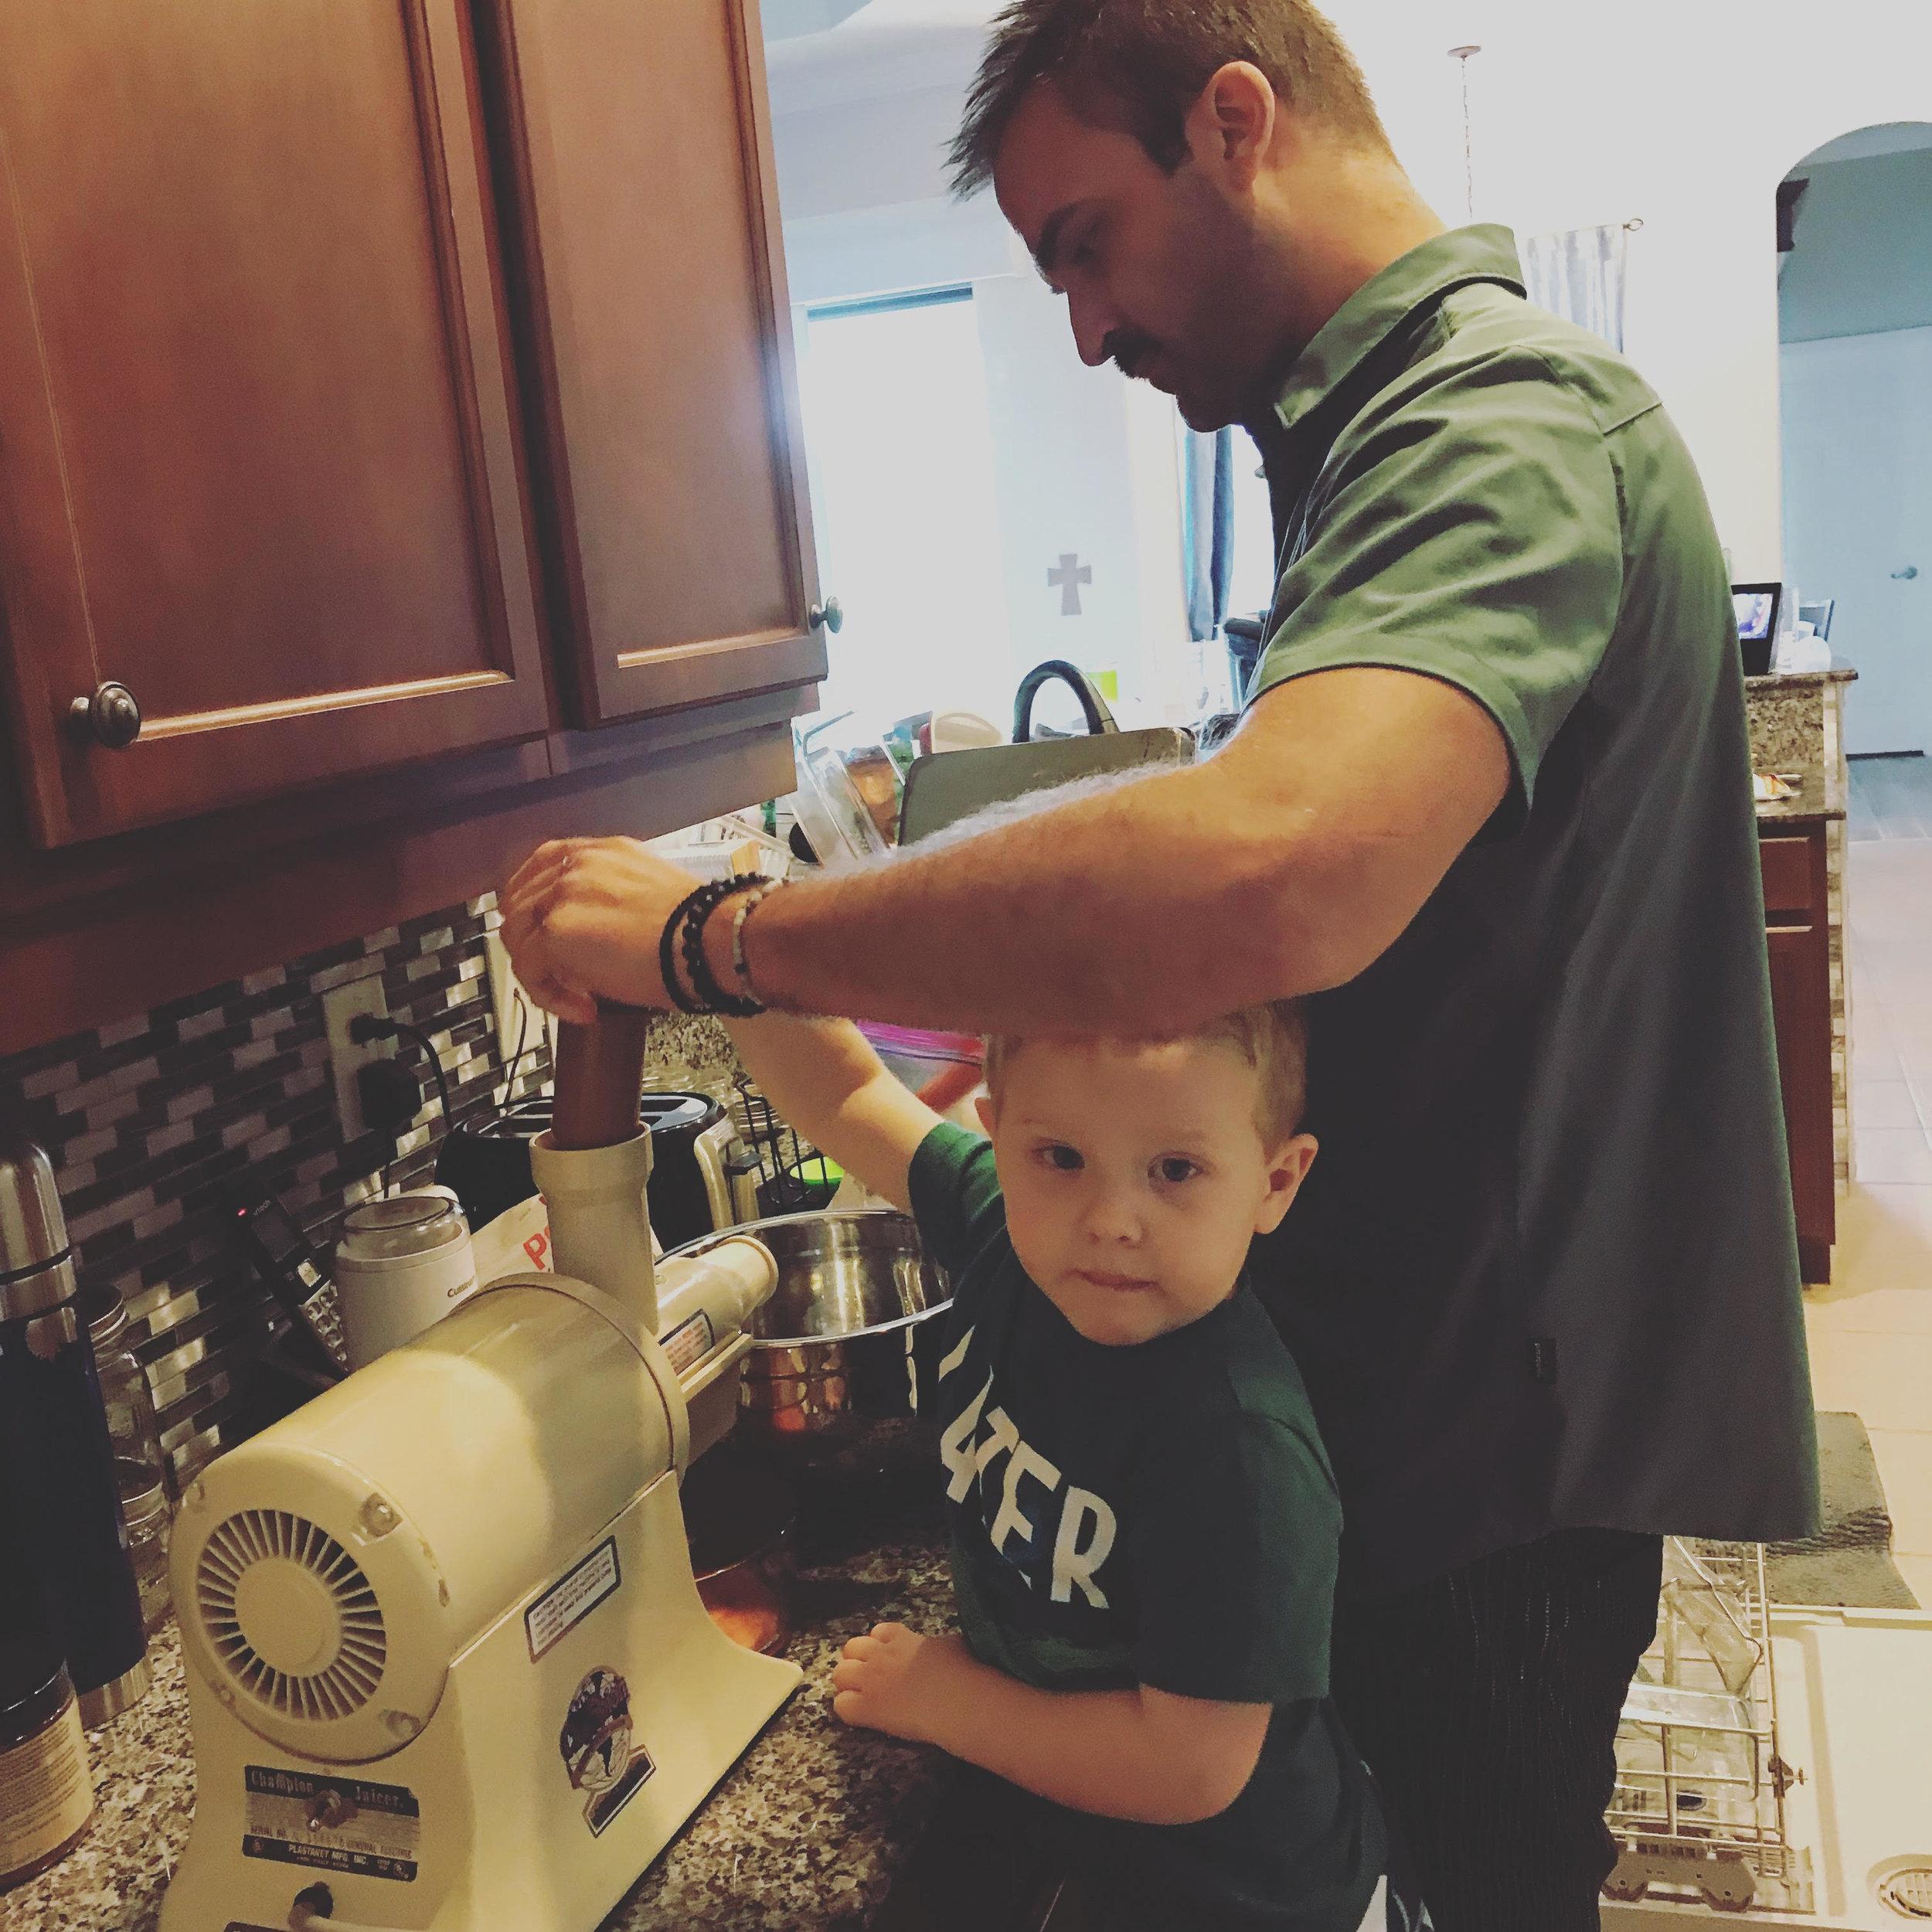 Nephew & I Juicing - 2018